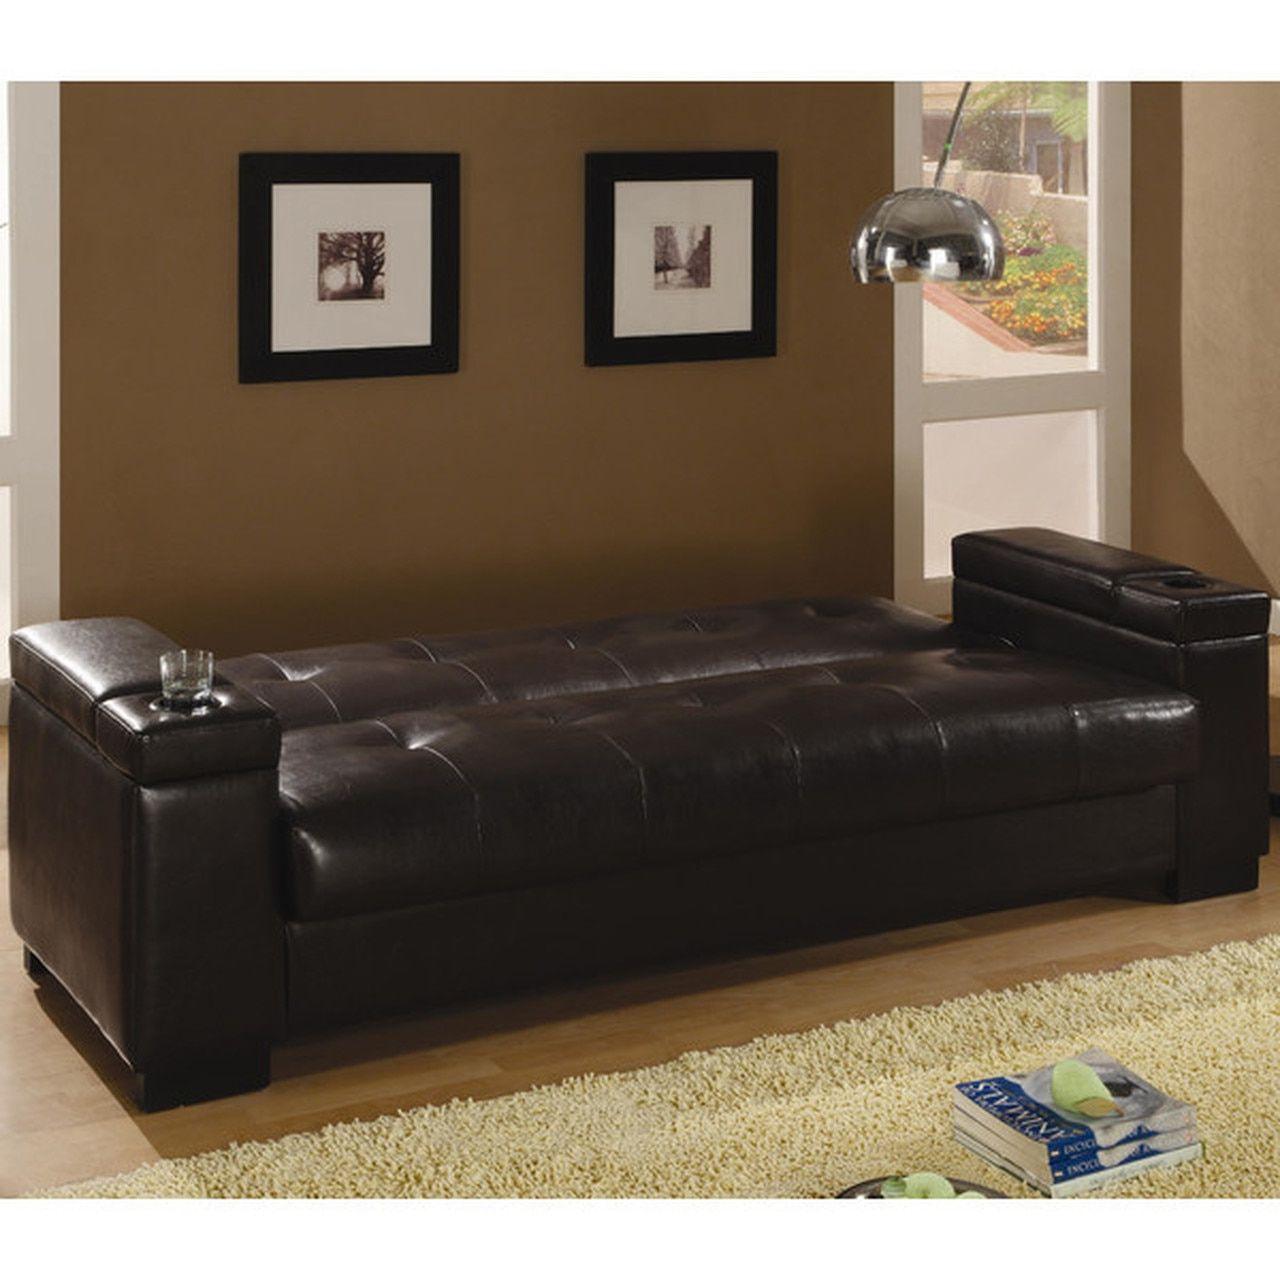 Coaster Montego Convertible Leather Sofa In Dark Brown Leather Sleeper Sofa Leather Sofa Bed Sofa